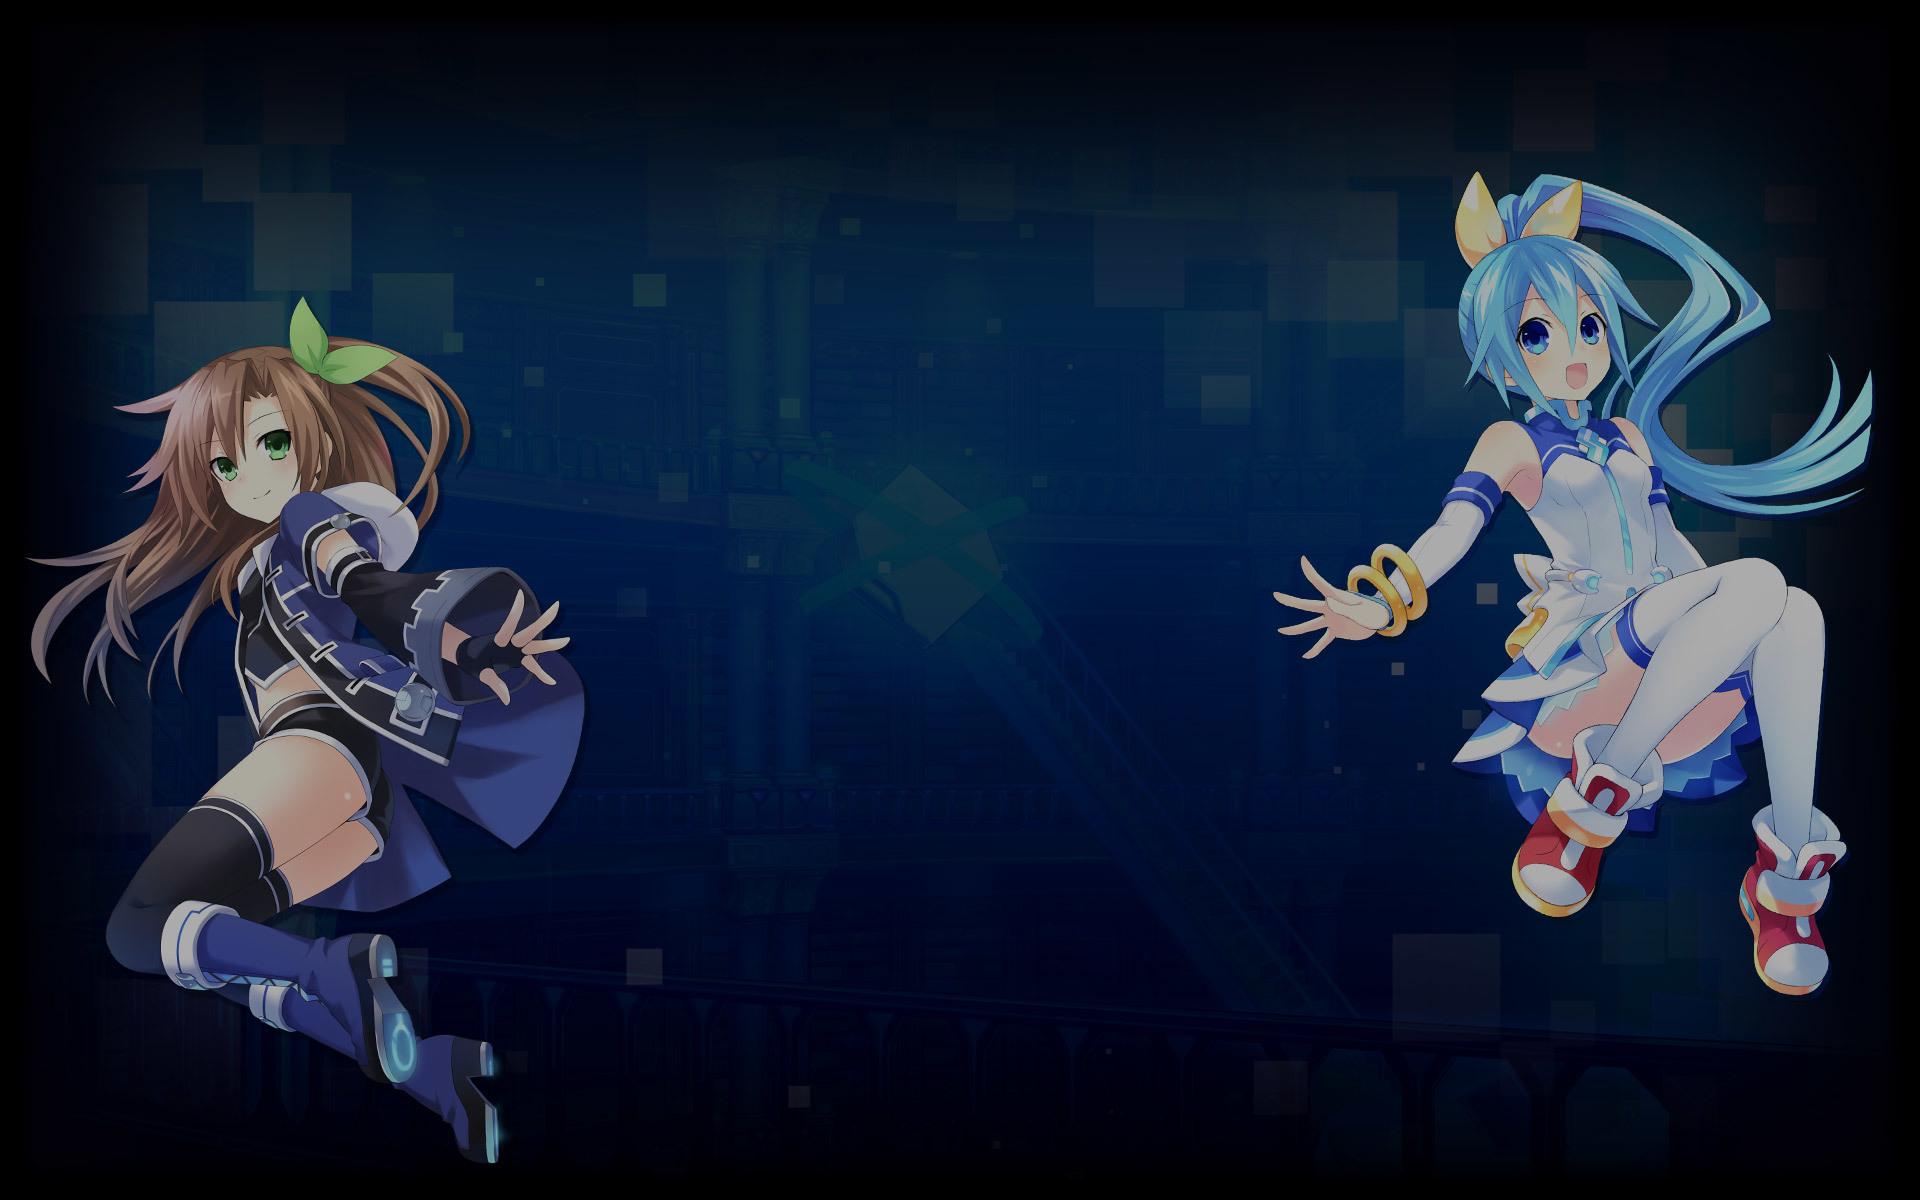 Superdimension Neptune vs SEGA Hard Girls Wallpaper 002 – IF & Segami